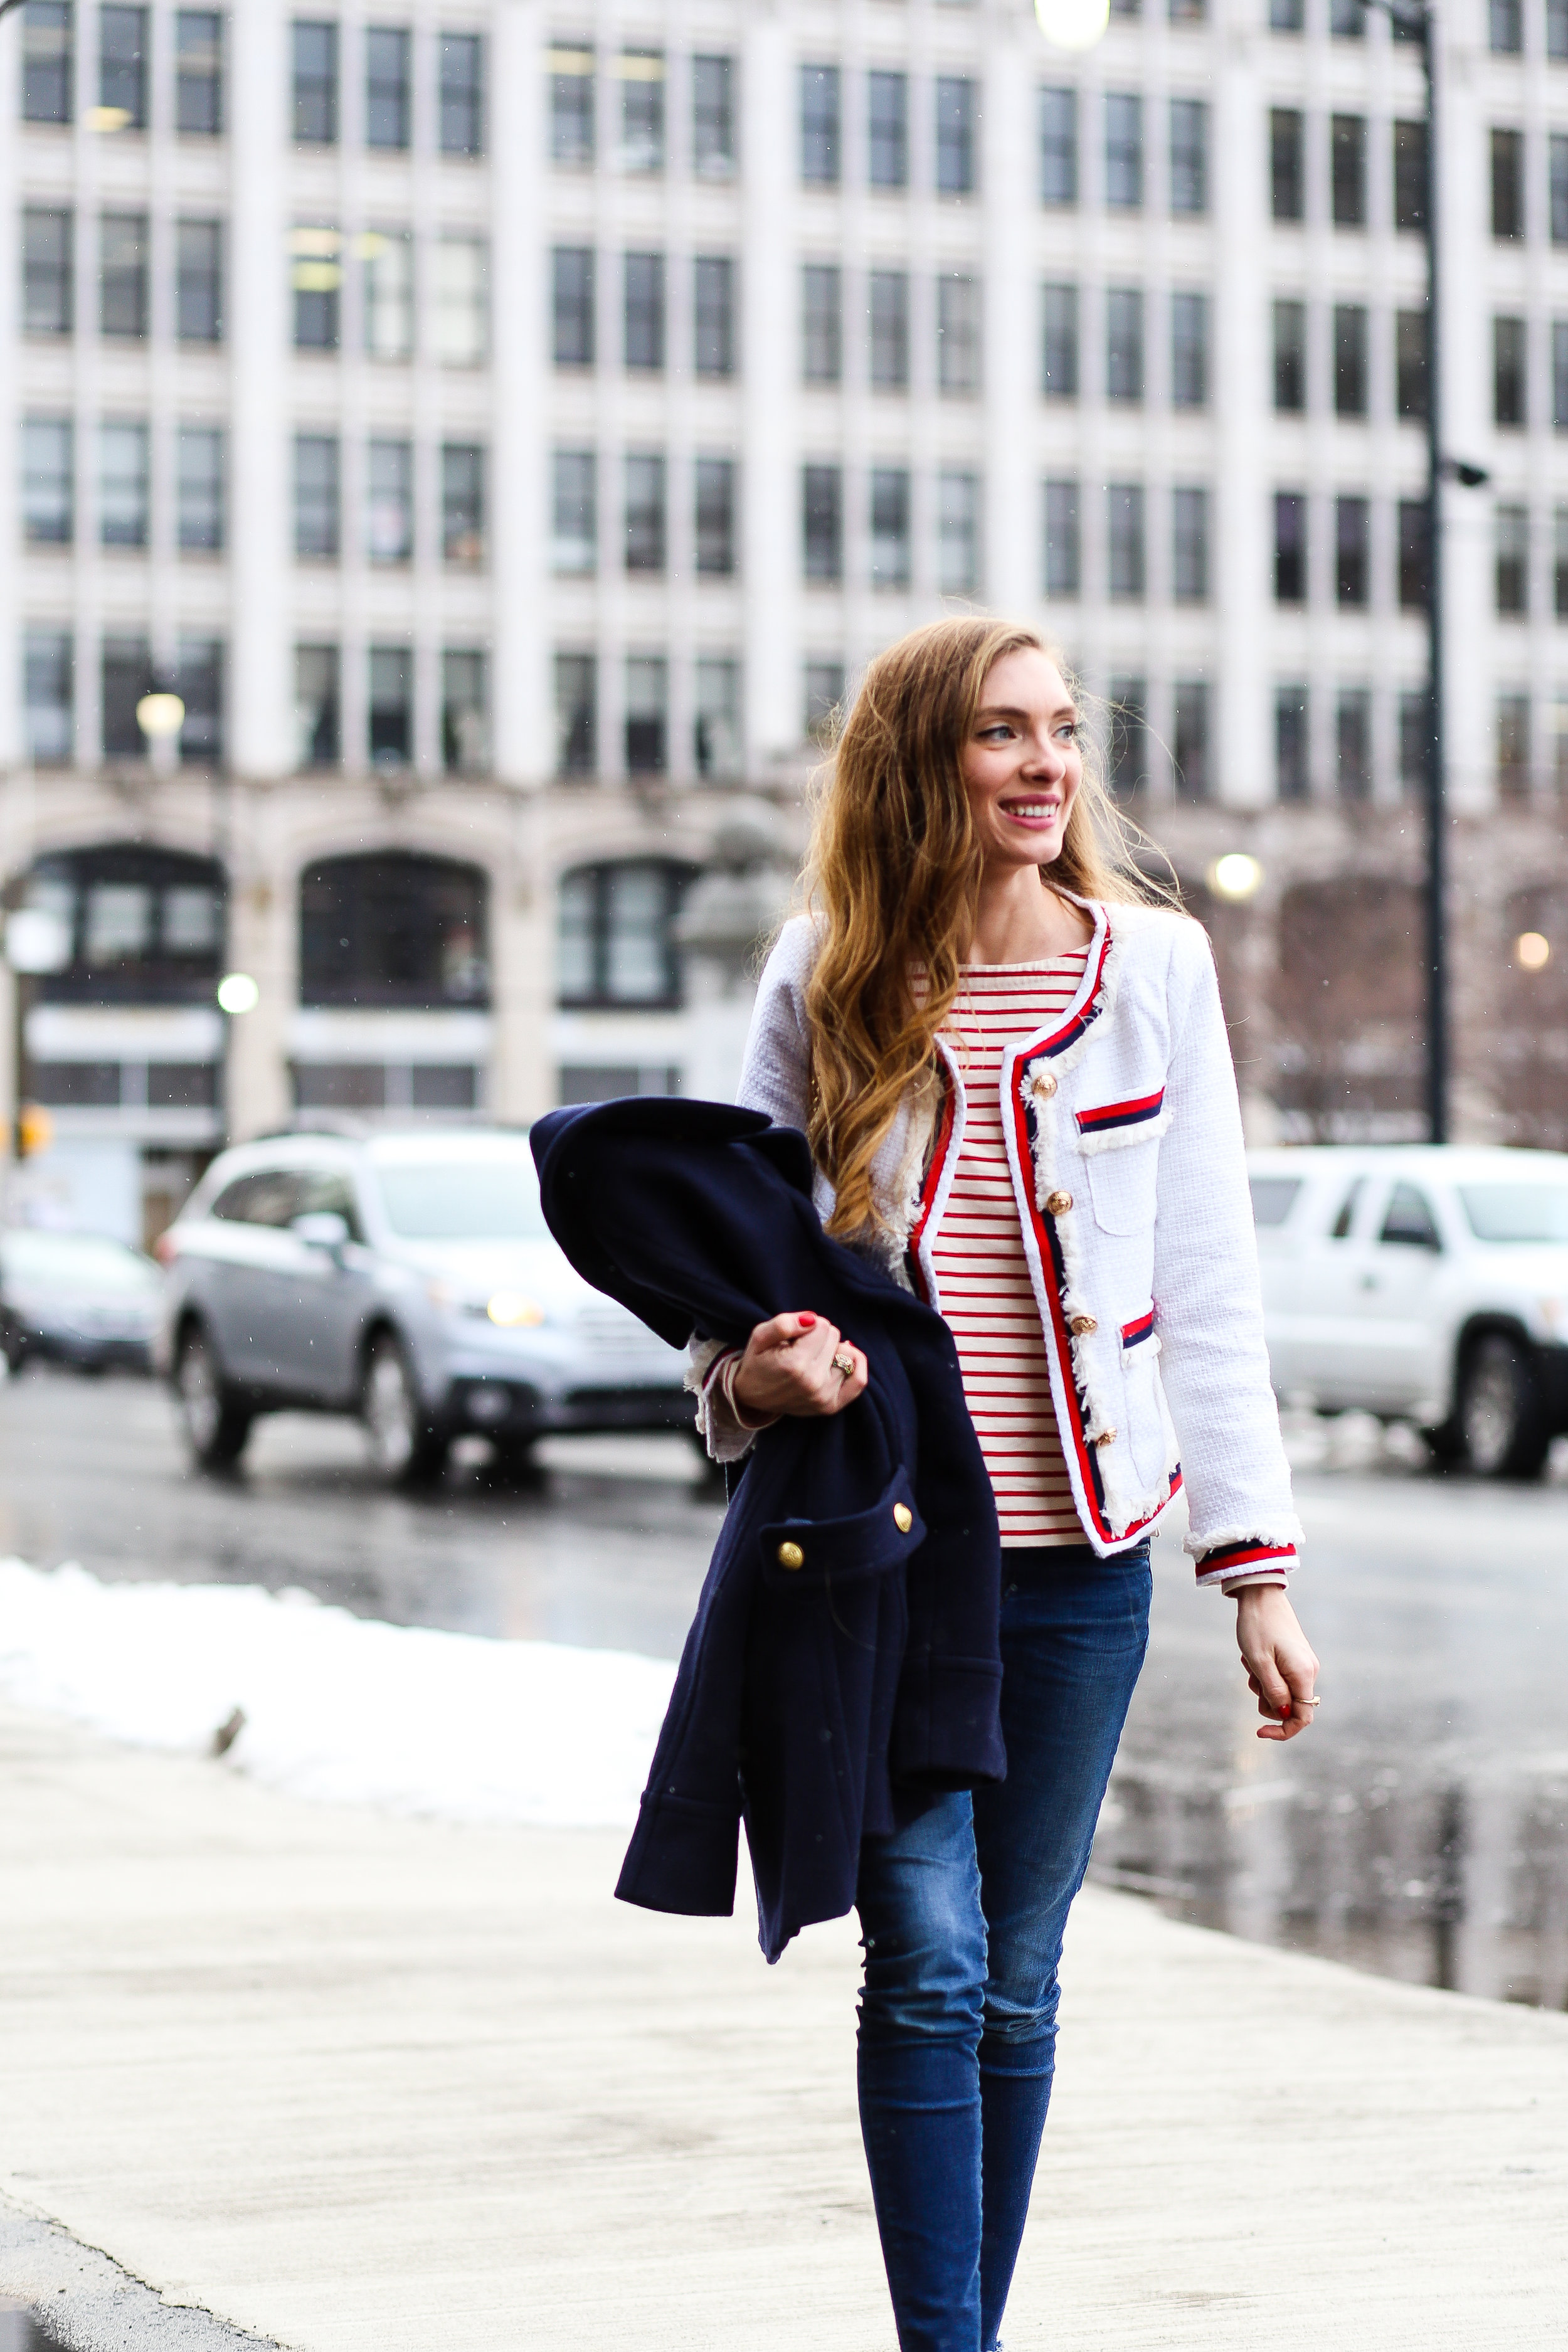 Red, White, and Blue Tweed Blazer- Enchanting Elegance